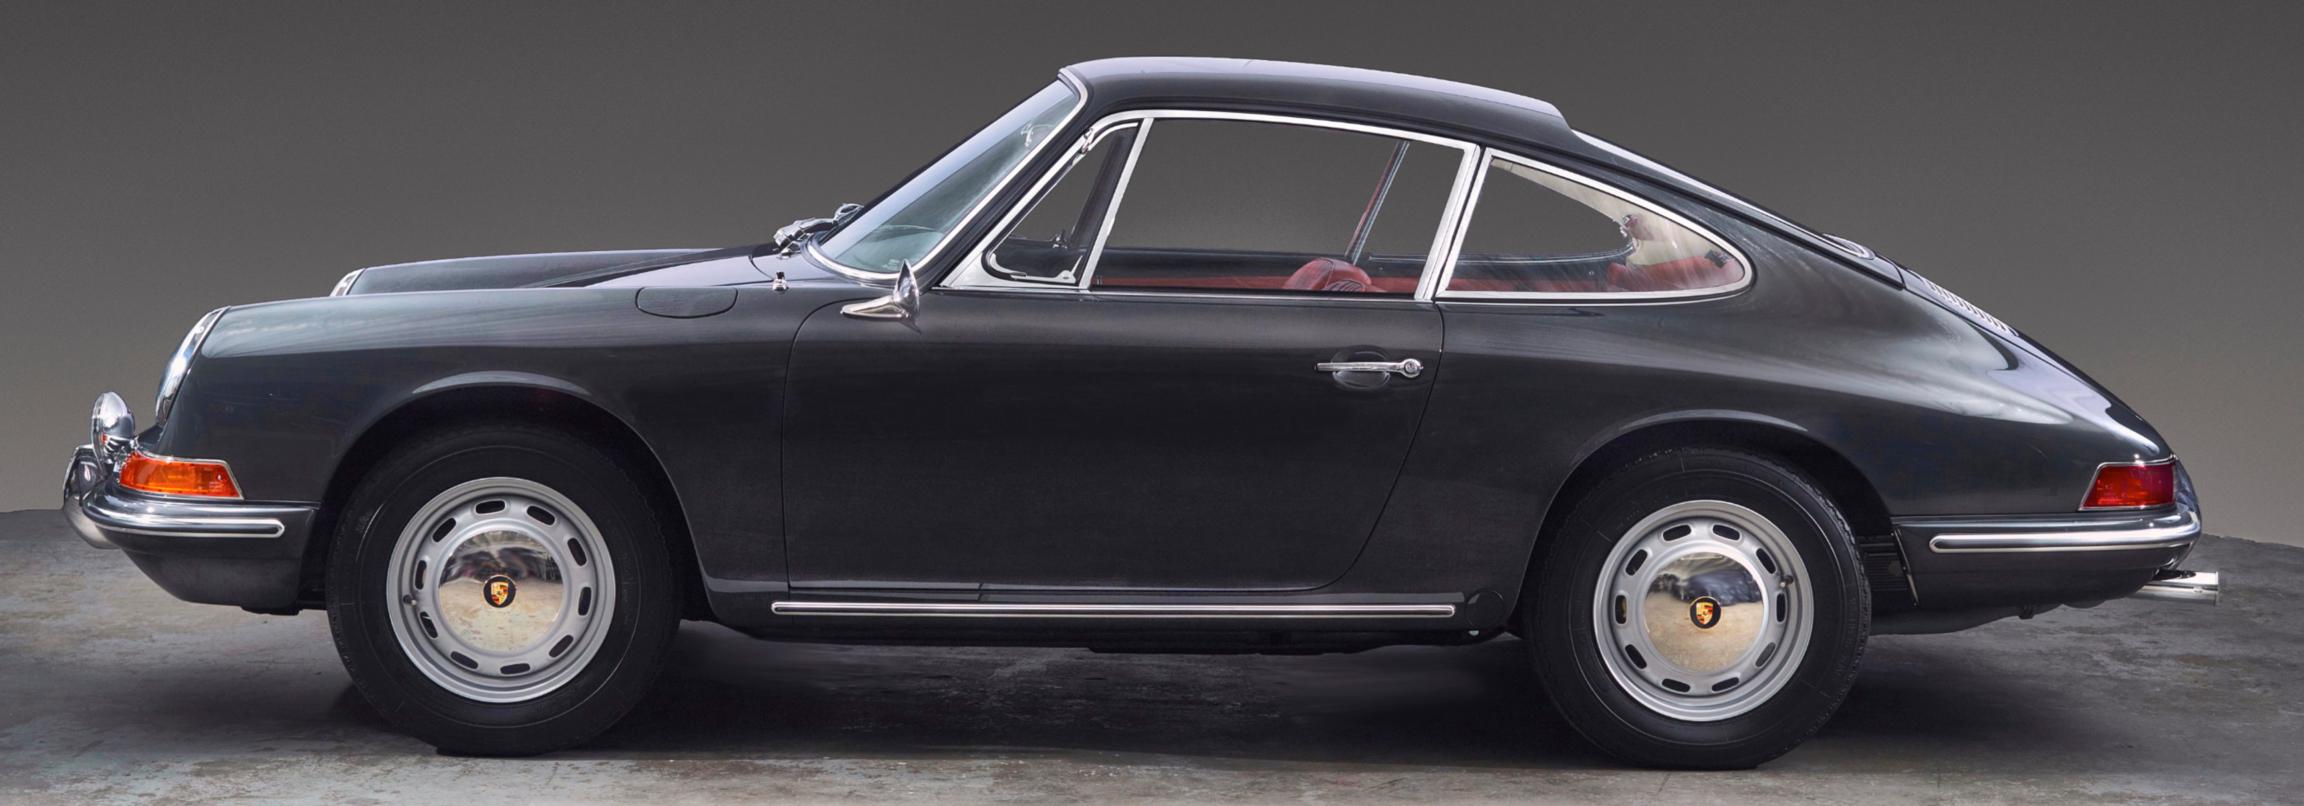 1966 Porsche 911 - 2015 PCA Best Overall Restoration Award Winner